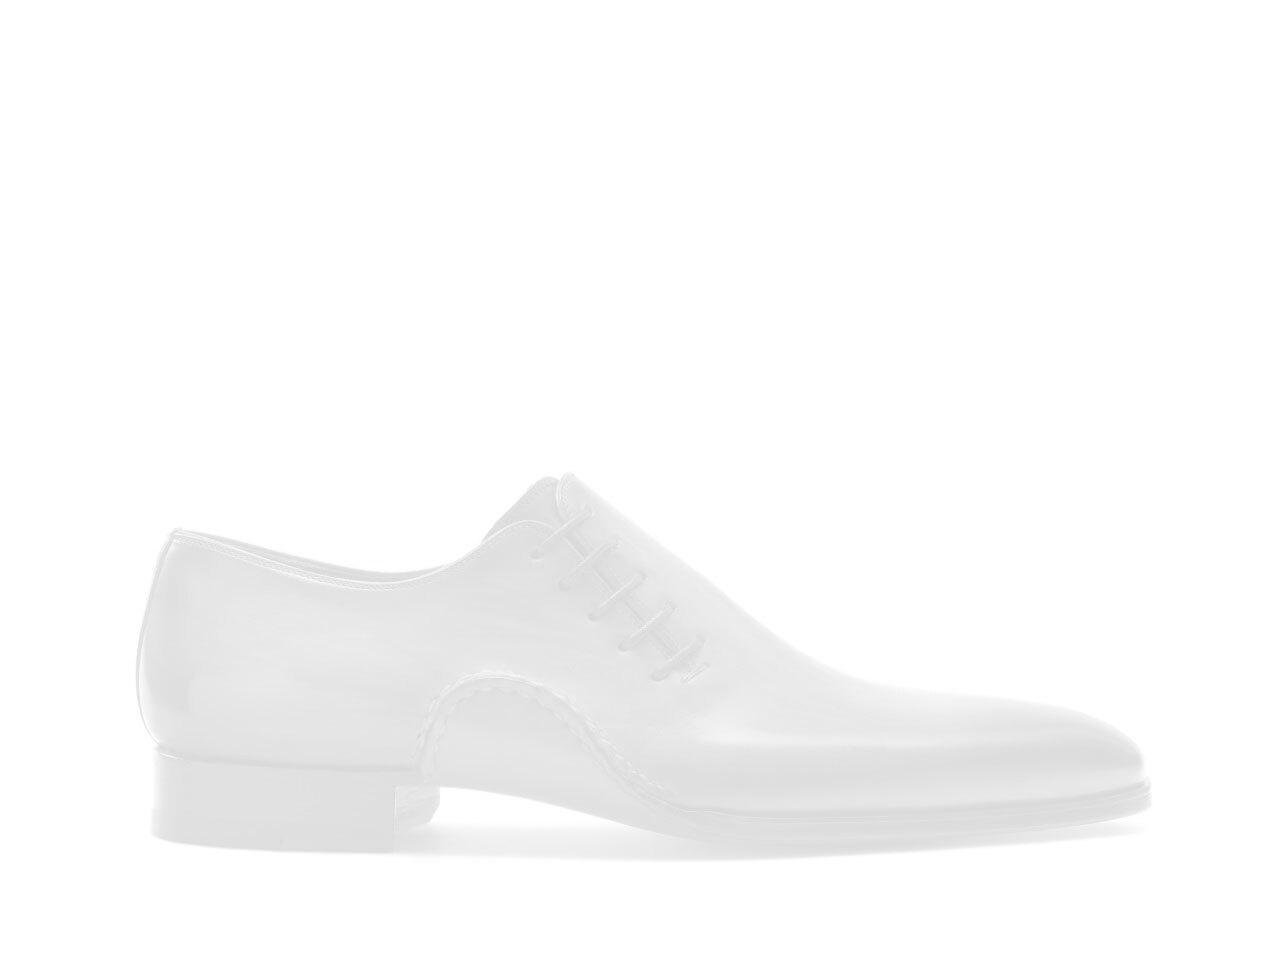 Pair of the Magnanni Marco Cuero Men's Single Monk Strap Shoes